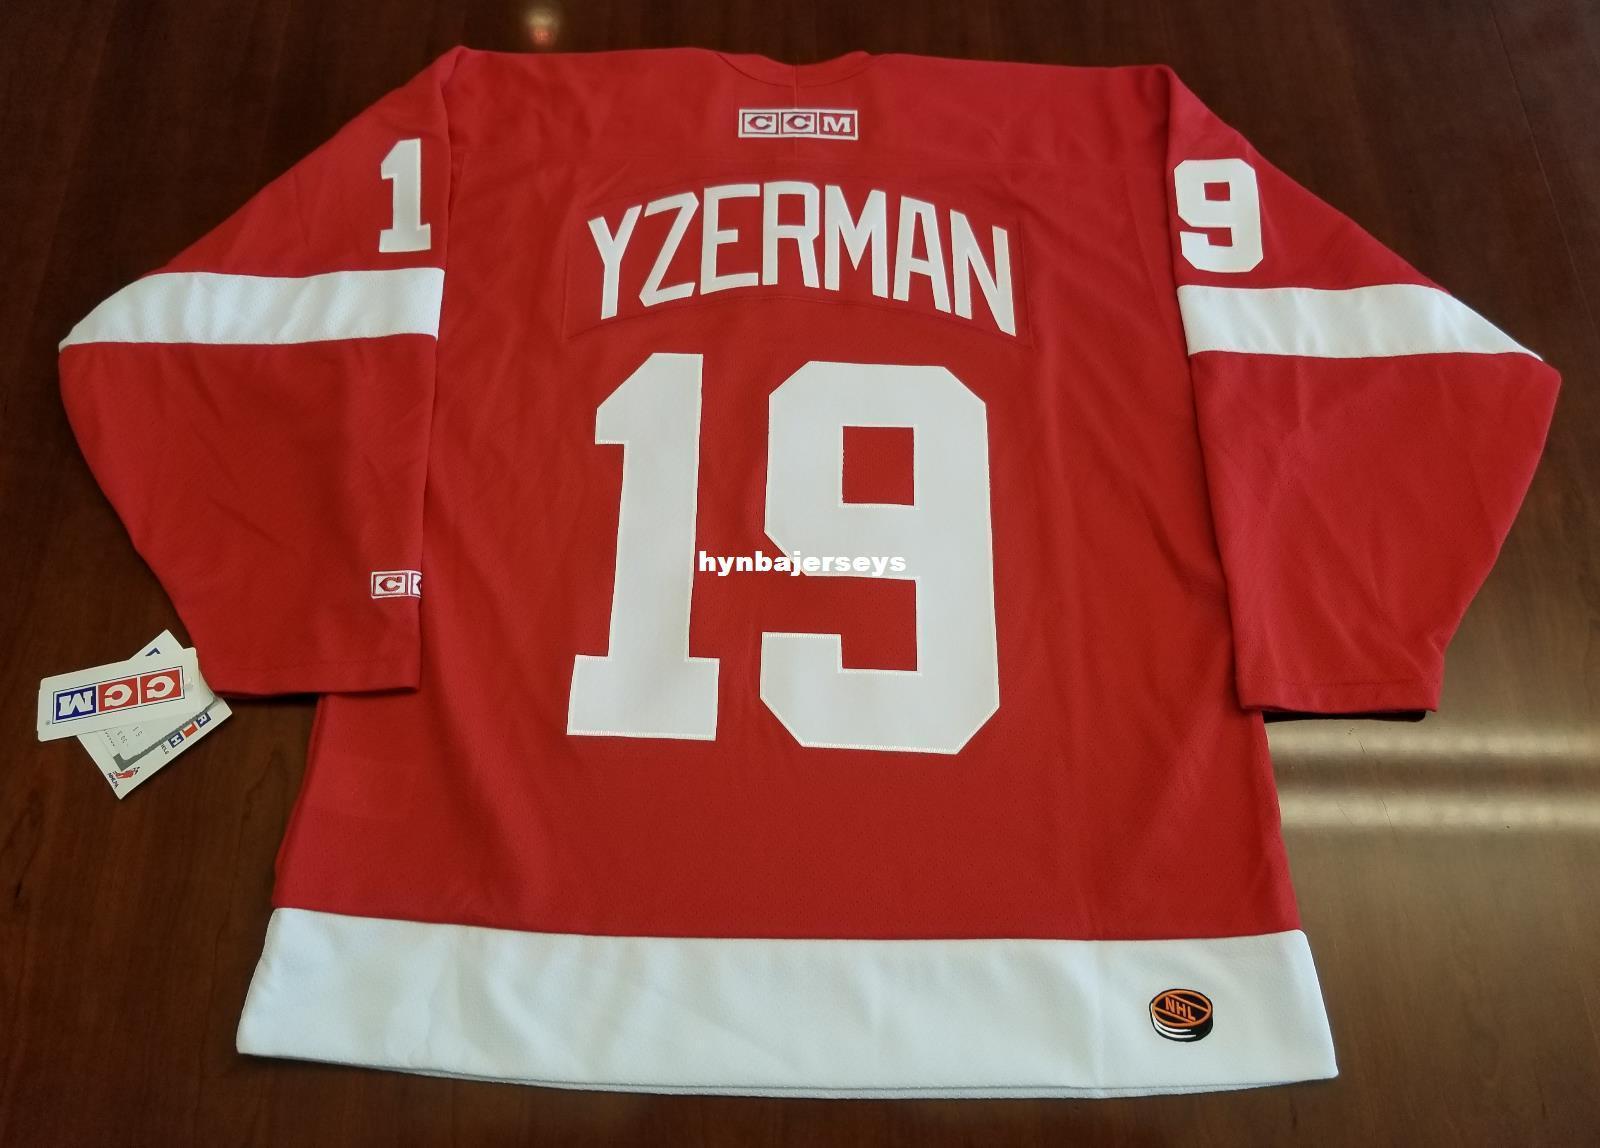 67e6ae25 2019 Custom Steve Yzerman Vintage Detroit Red Wings CCM Cheap Hockey Jersey  Red Mens Retro Jerseys From Hynbajerseys, $26.25 | DHgate.Com